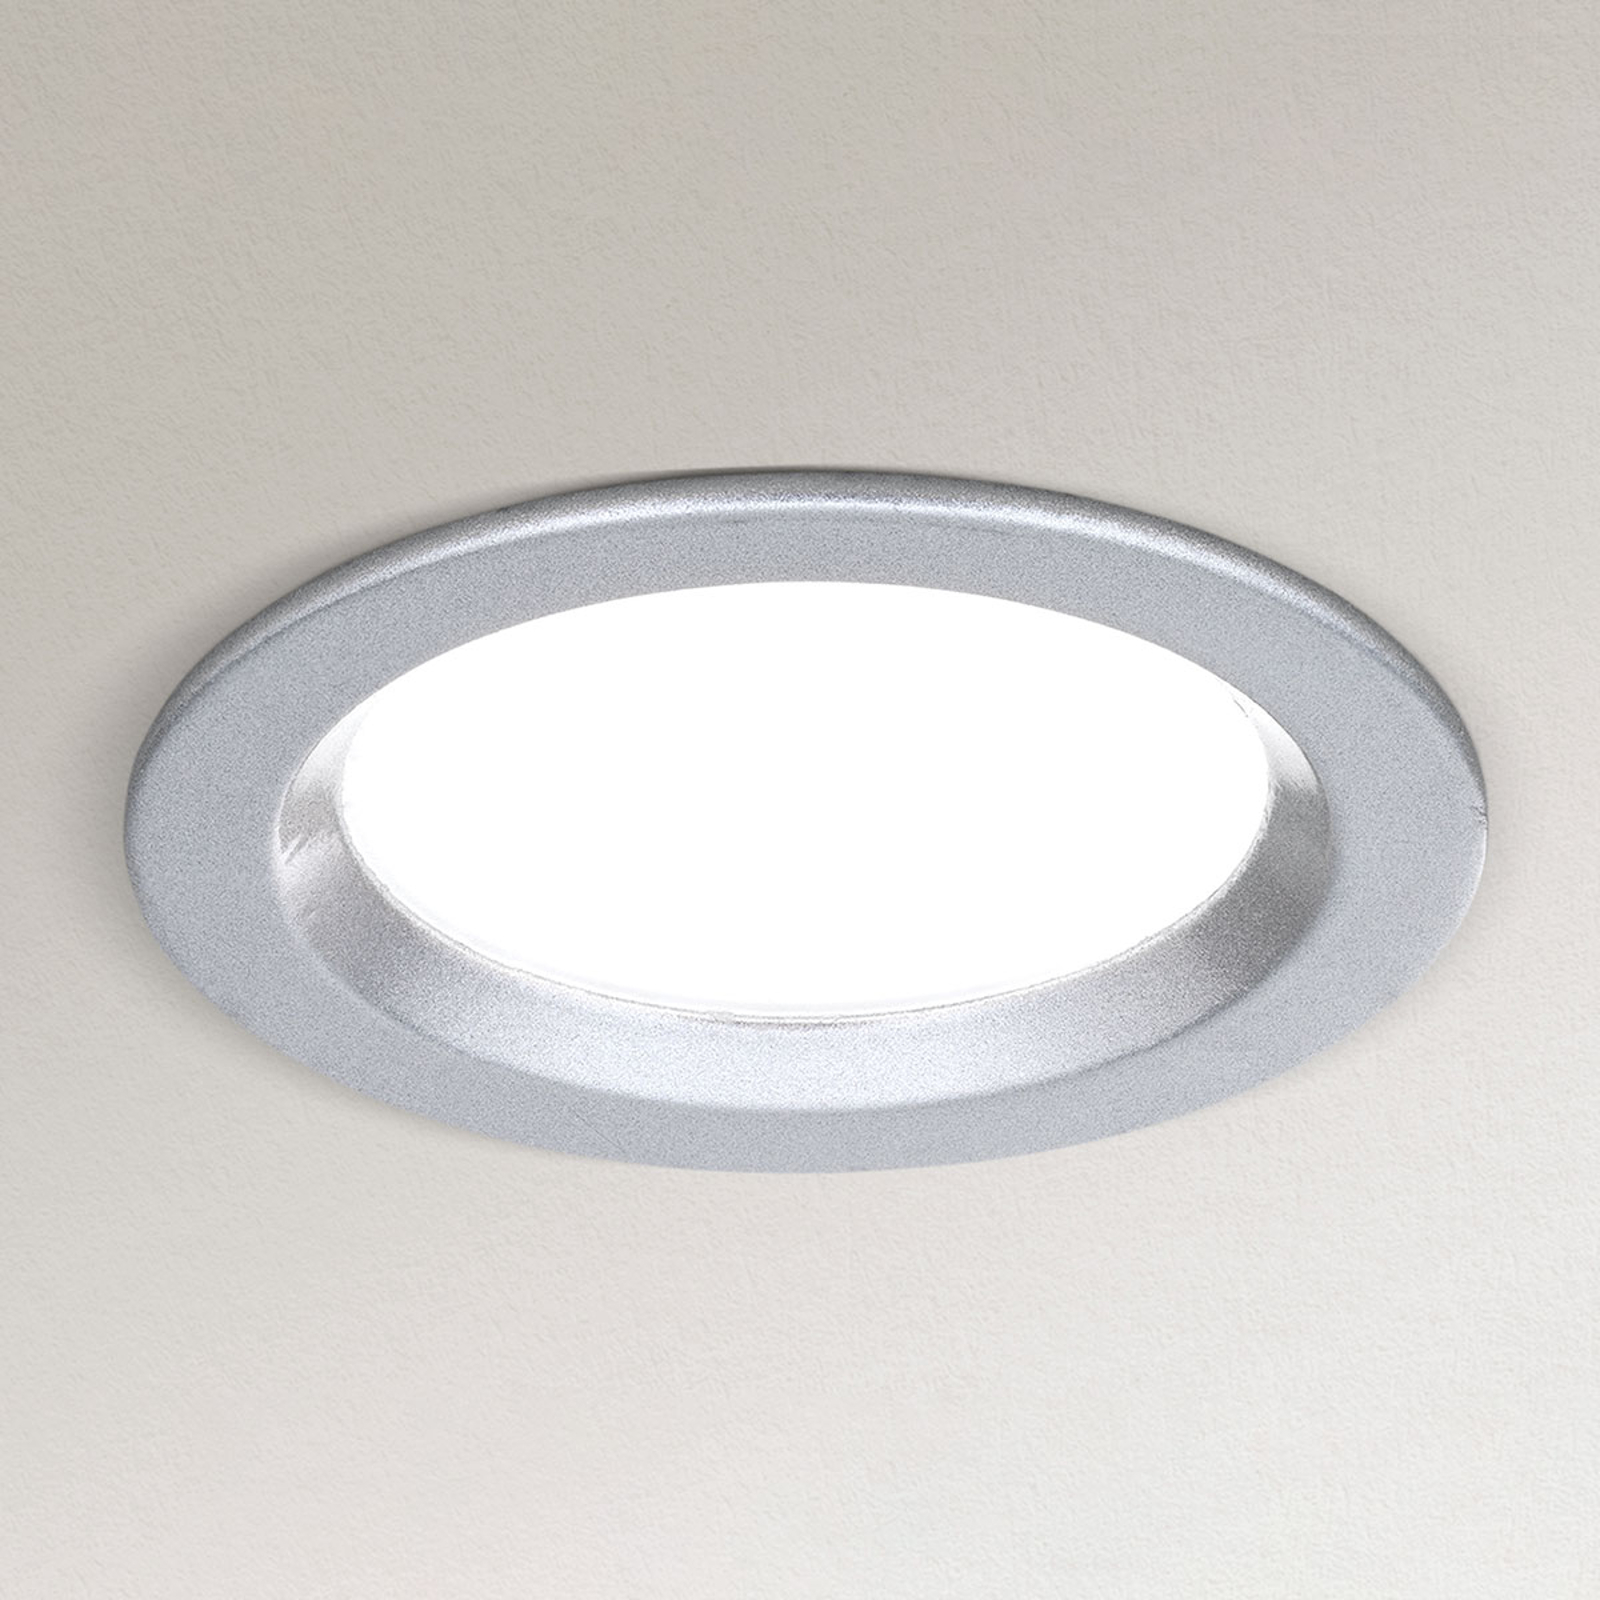 Dimmbare LED-Einbauleuchte Spock Ø 9 cm silber